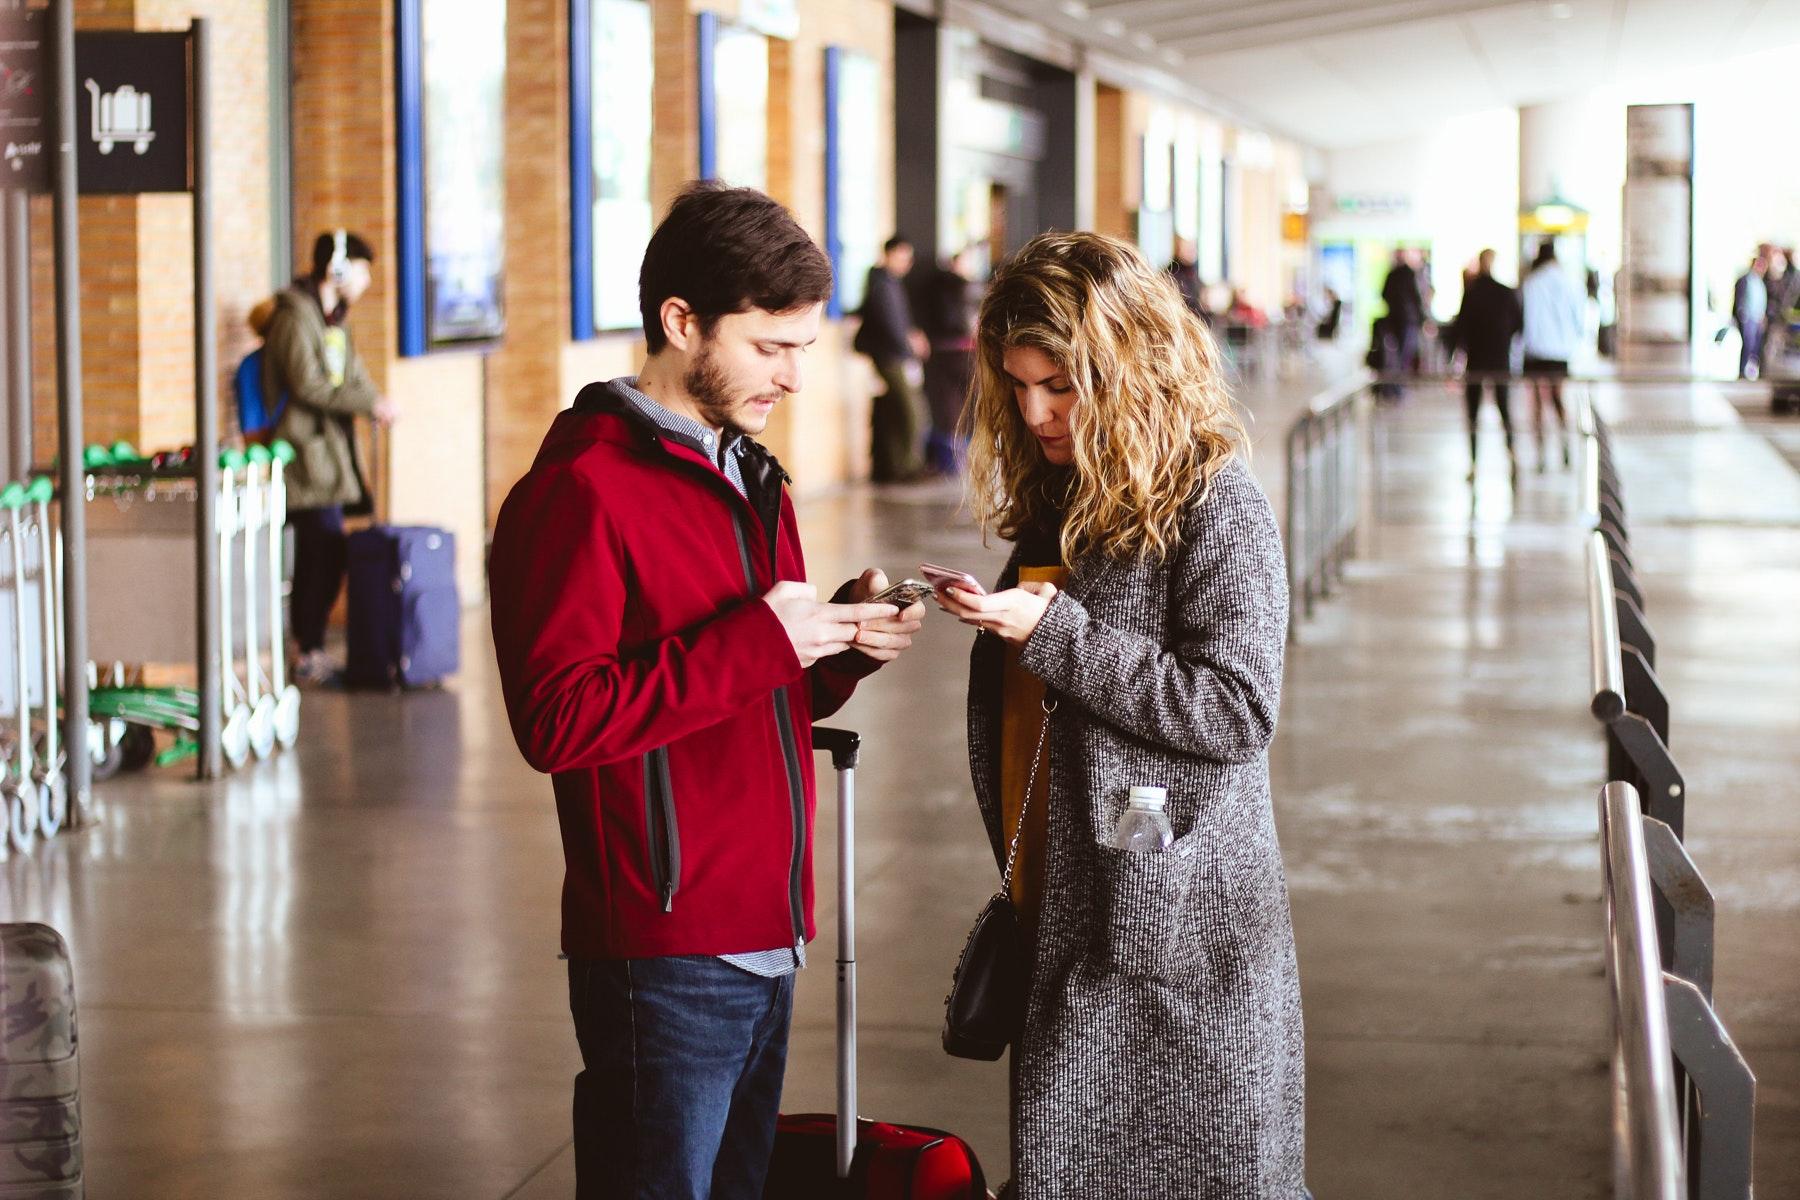 adult-airport-apparel-993607.jpg